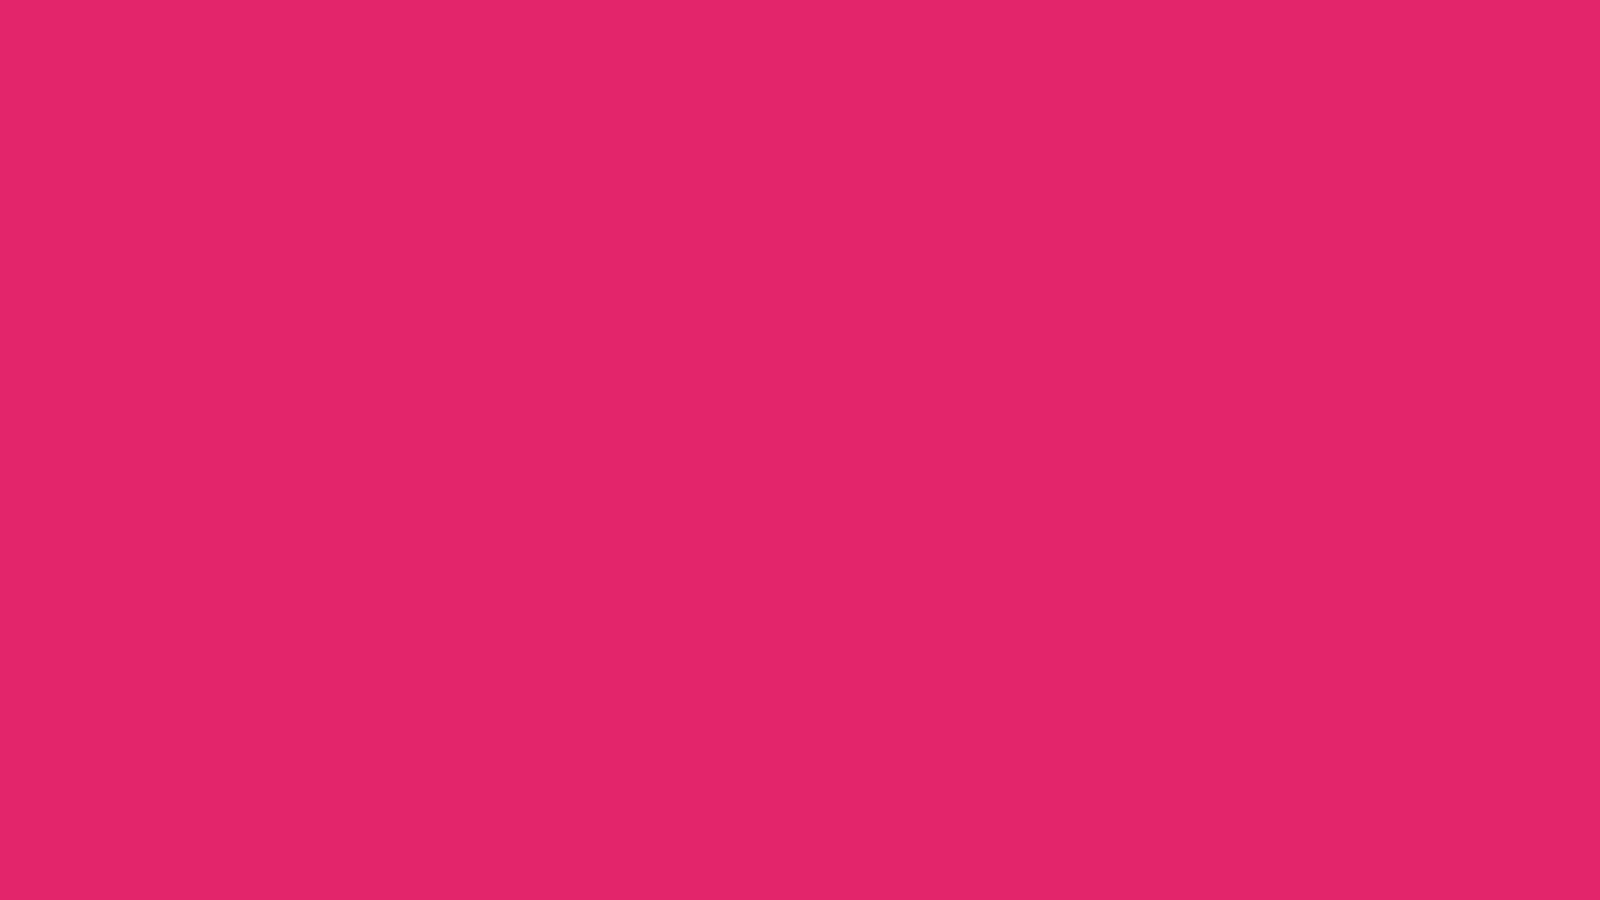 1600x900 Razzmatazz Solid Color Background